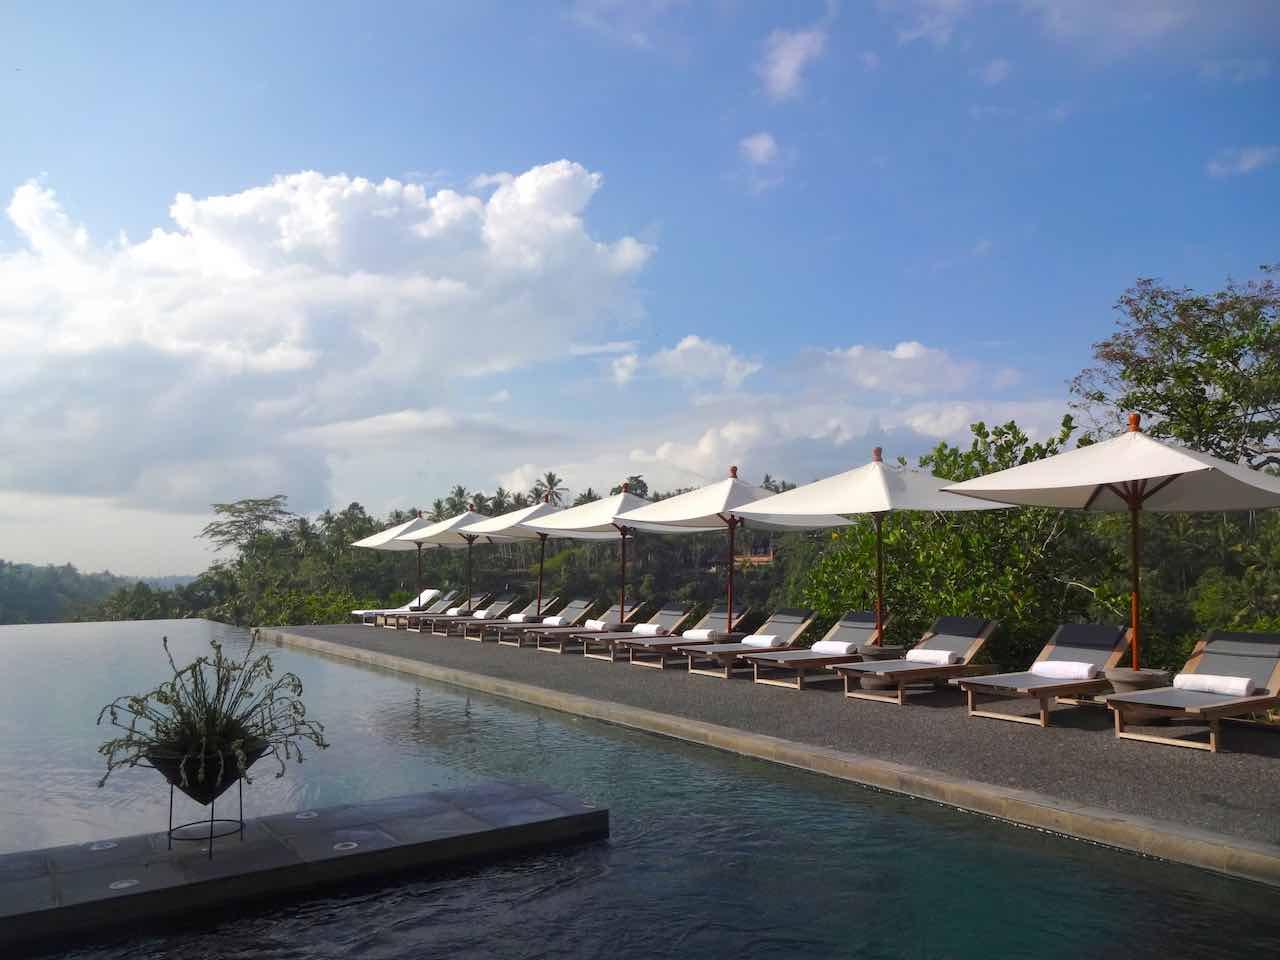 Best 5 star hotel villa ubud alila bali luxury bucket list for Best hotel in bali 2016